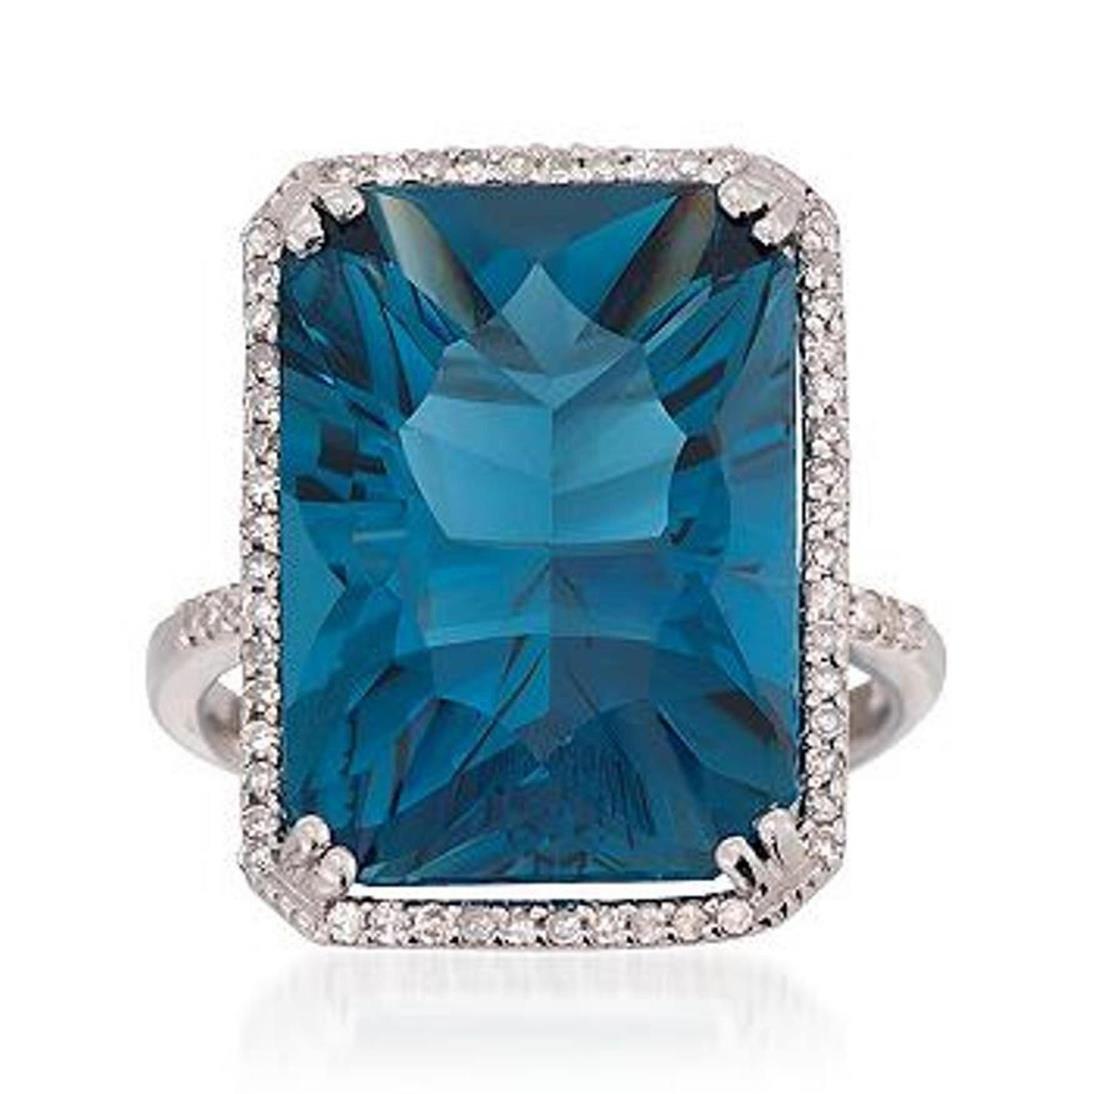 19.88 Carat London Blue Topaz and .26 ct. t.w. Diamond